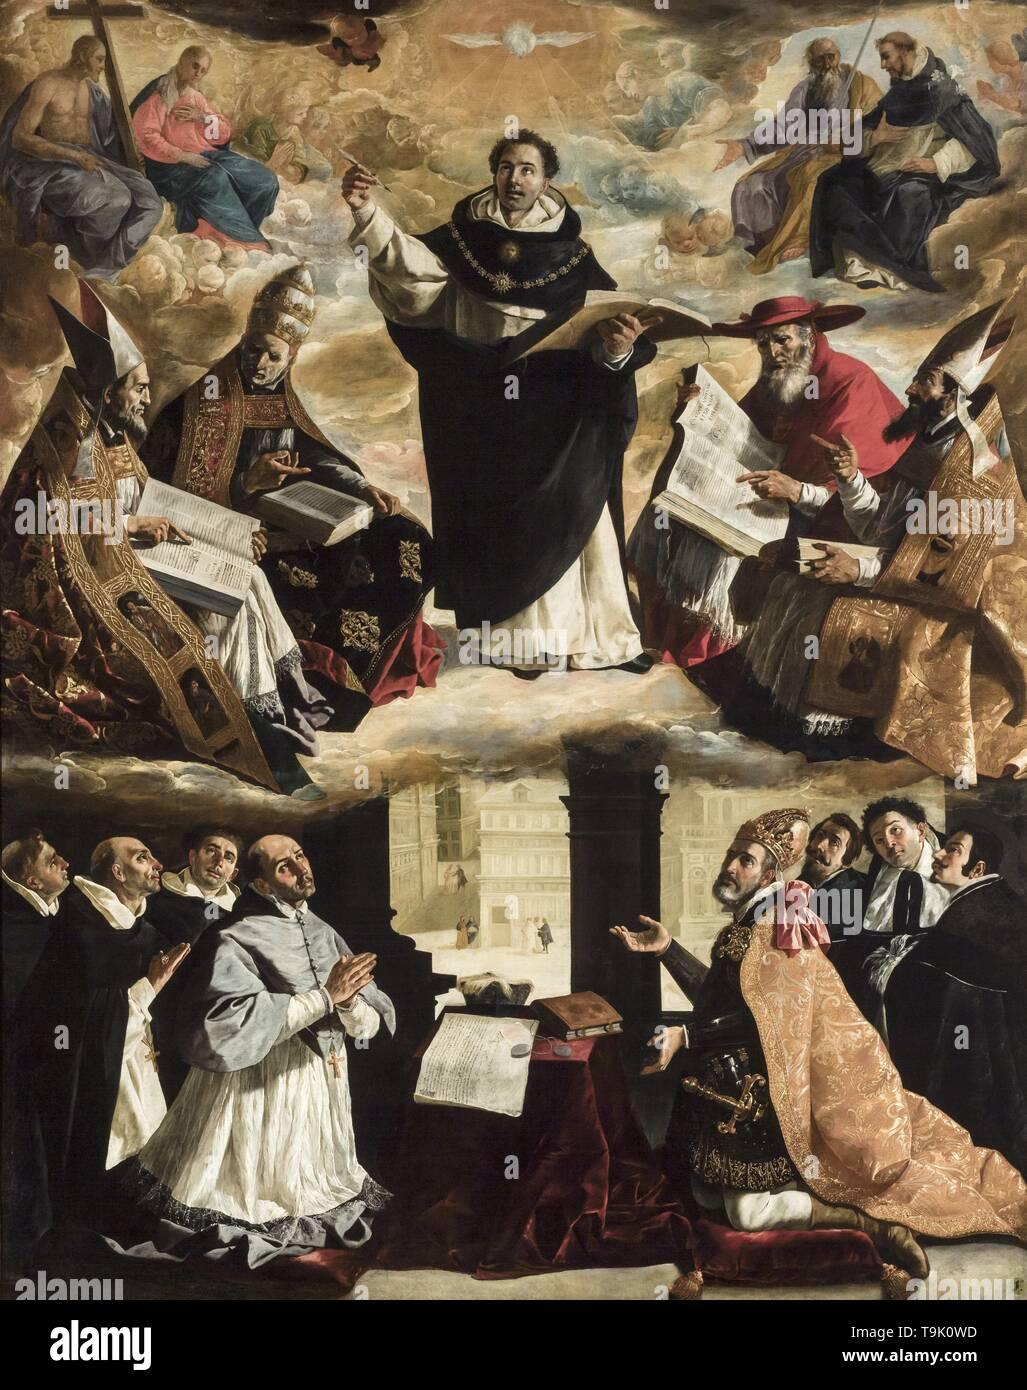 The Apotheosis of Saint Thomas Aquinas. Museum: Museo de Bellas Artes, Sevilla. Author: FRANCISCO DE ZURBARÁN. - Stock Image